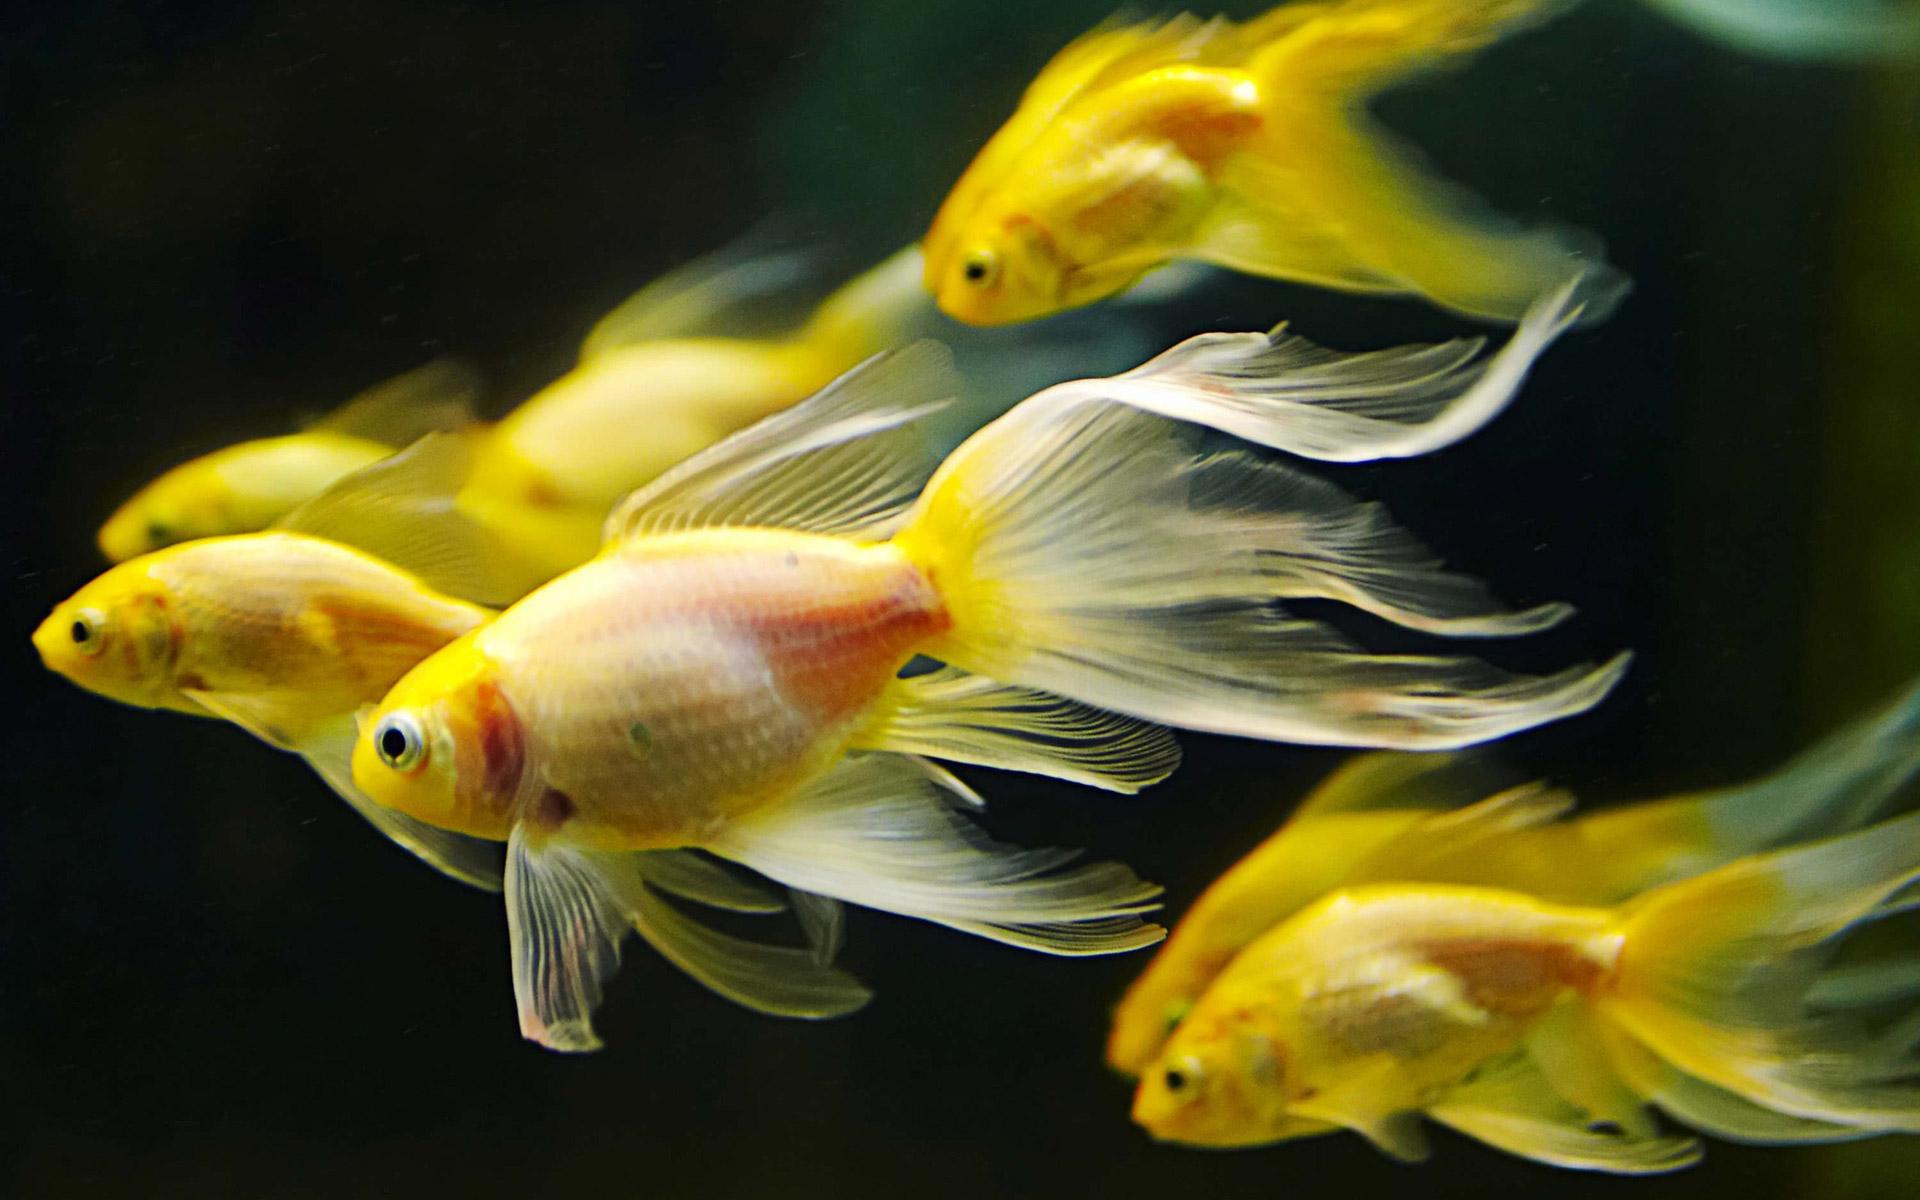 Fish aquarium wallpaper free download - Yellow Aquarium Fish Wallpapers55 Com Best Wallpapers For Pcs